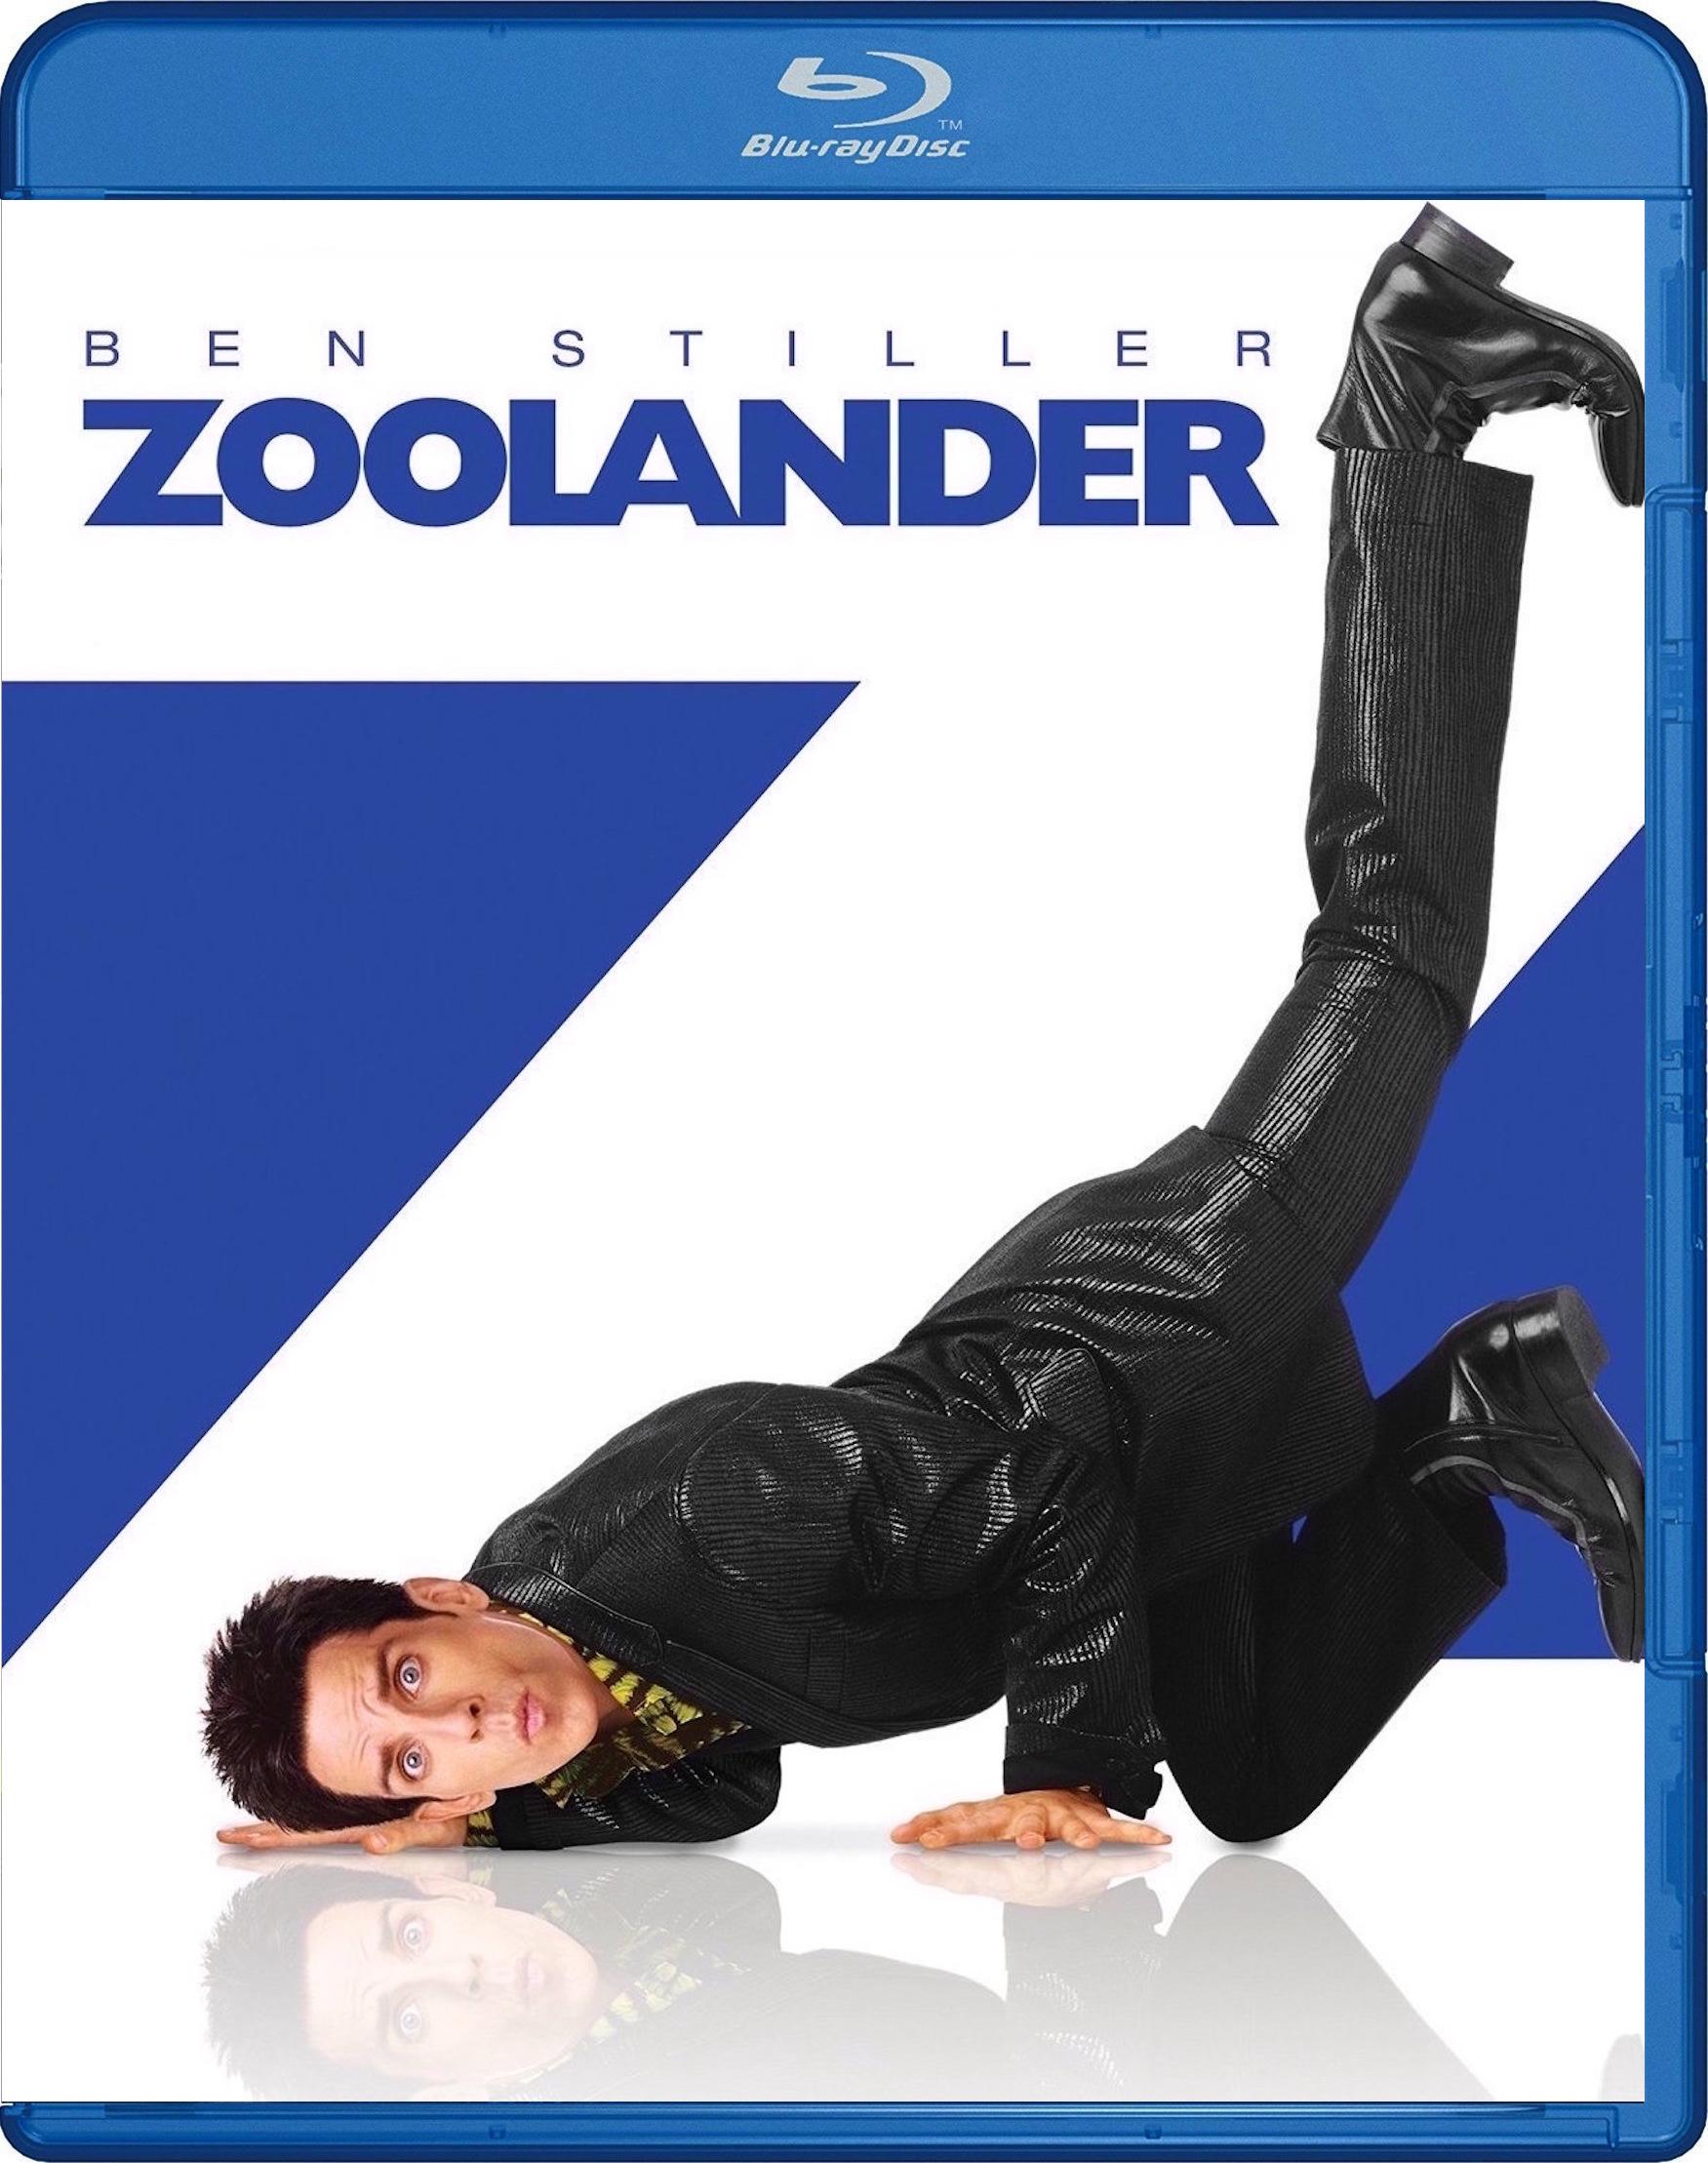 Zoolander (2001) Blu-ray